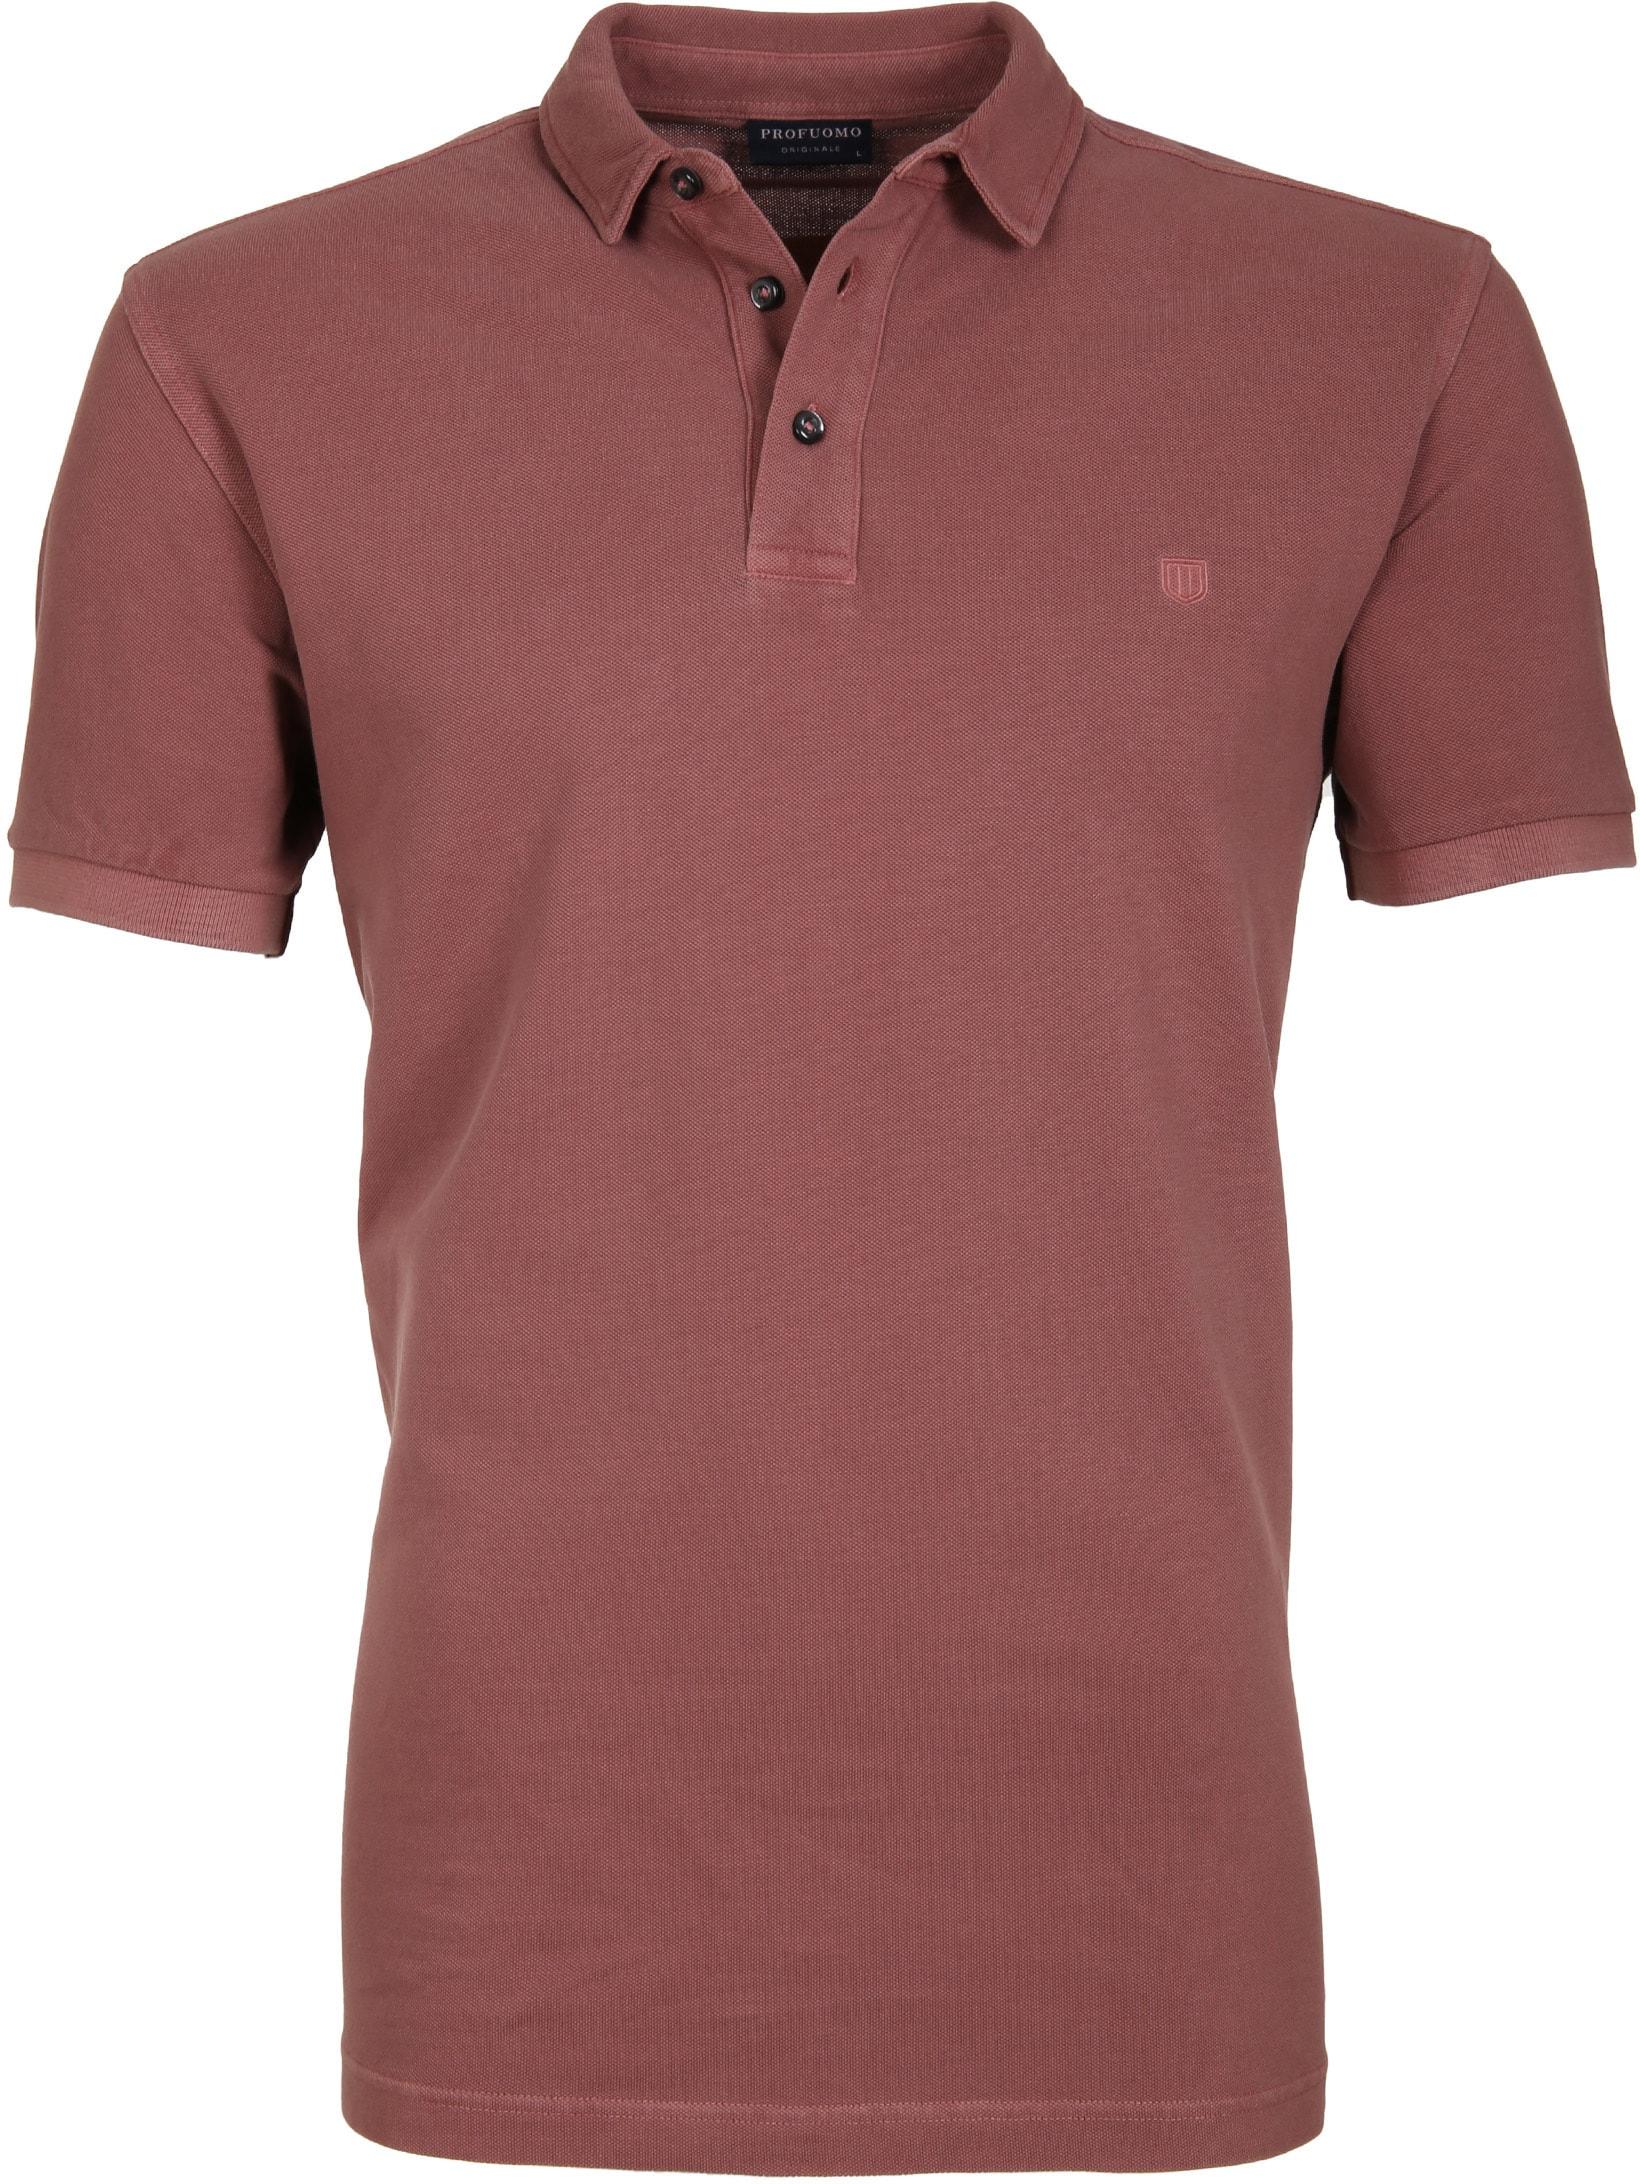 Profuomo Poloshirt Garment Bordeaux foto 0